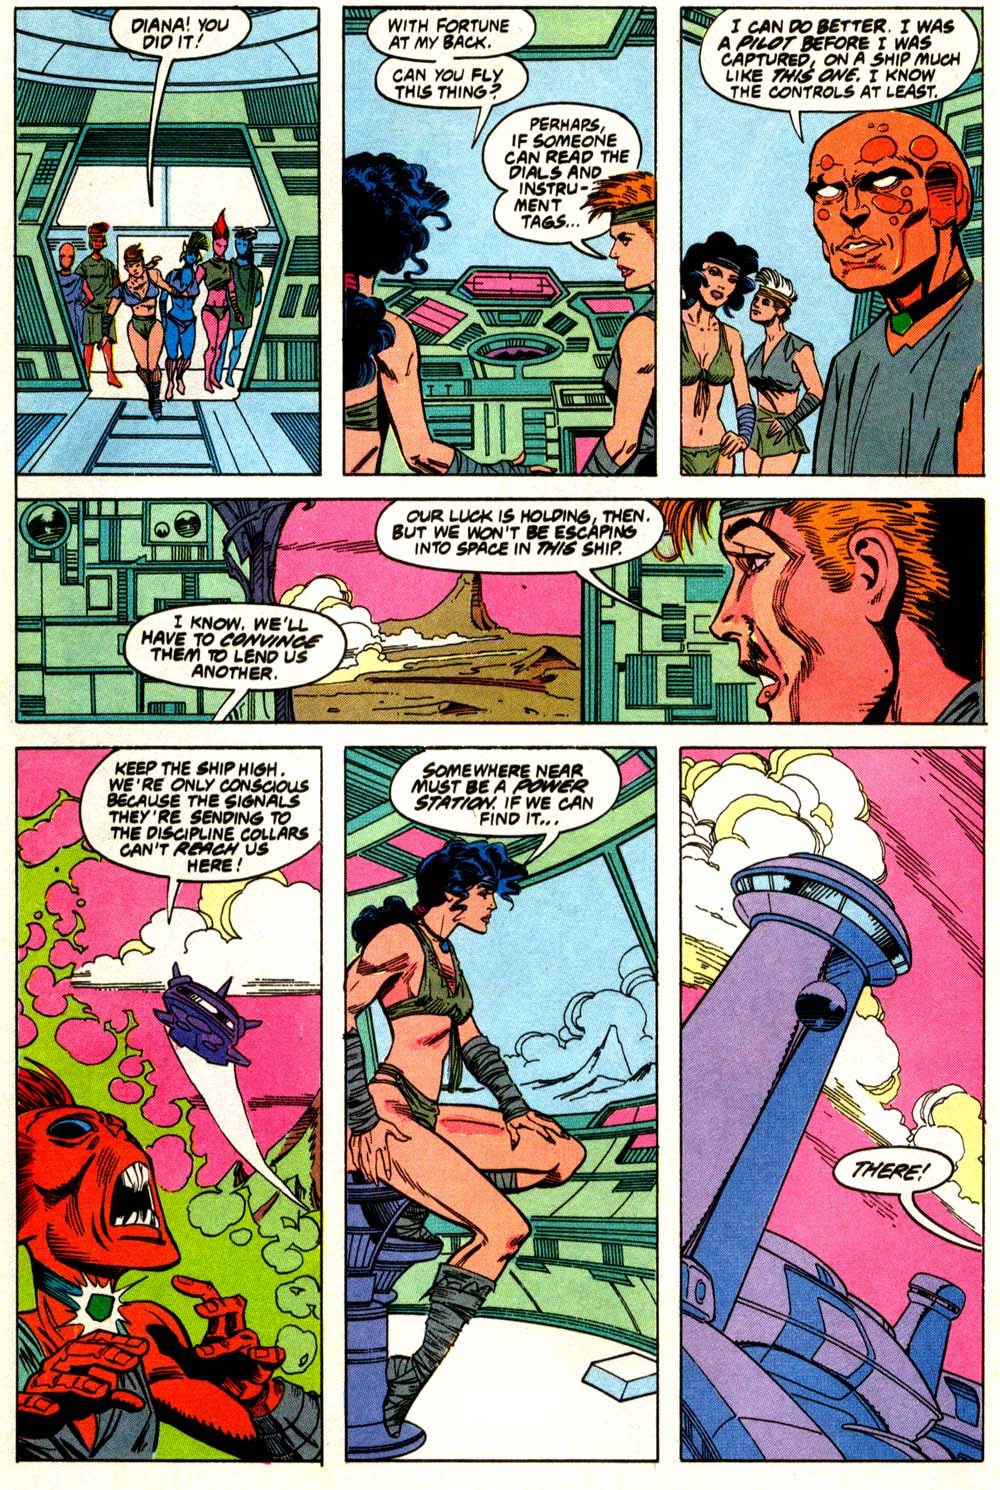 Read online Wonder Woman (1987) comic -  Issue #68 - 19